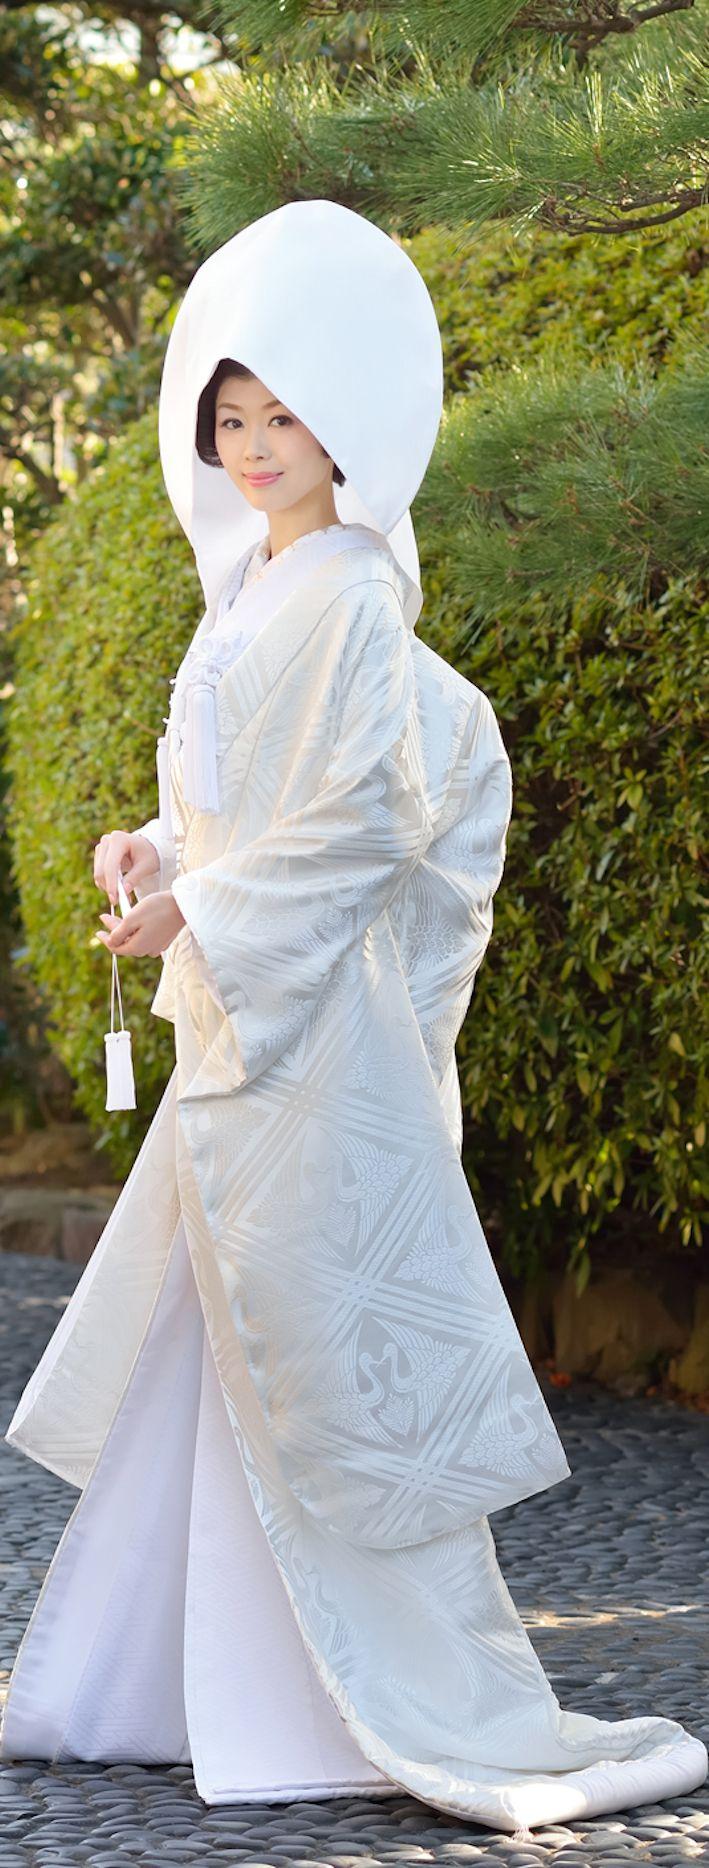 25 best ideas about japanese wedding dresses on pinterest Wedding dress japan